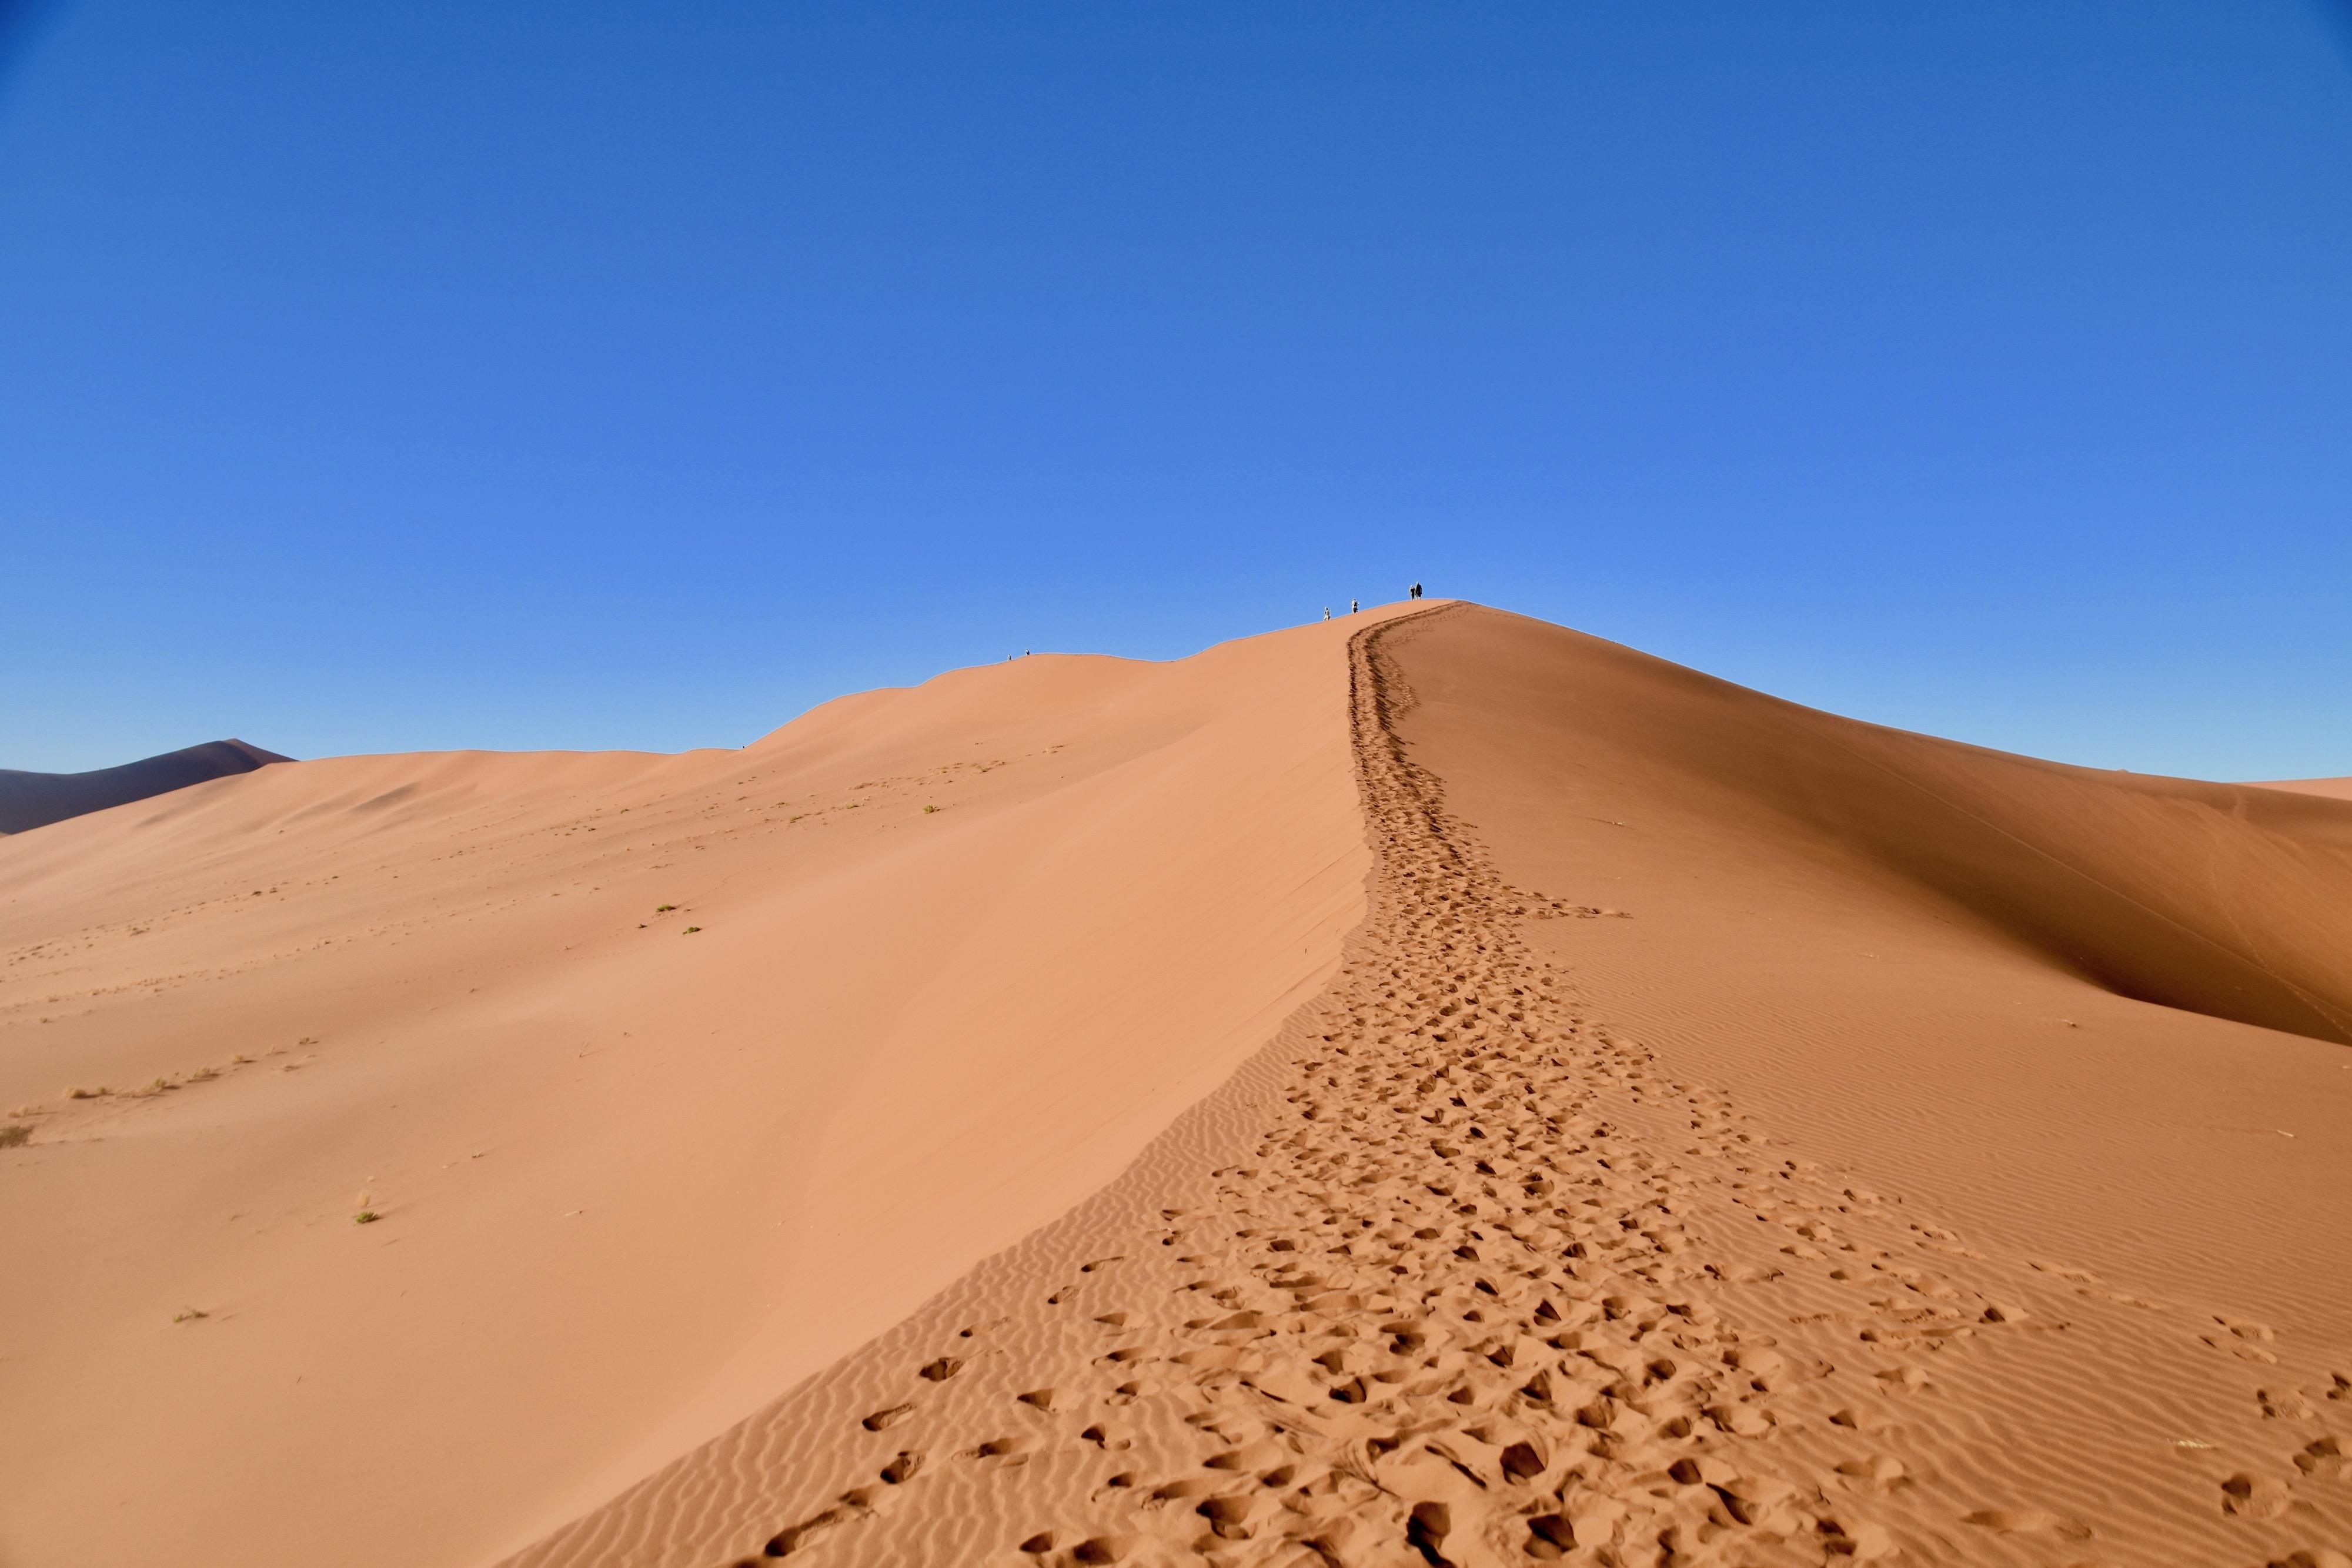 Sossusvlei Namibia S Wondrous Sand Dunes The Maritime